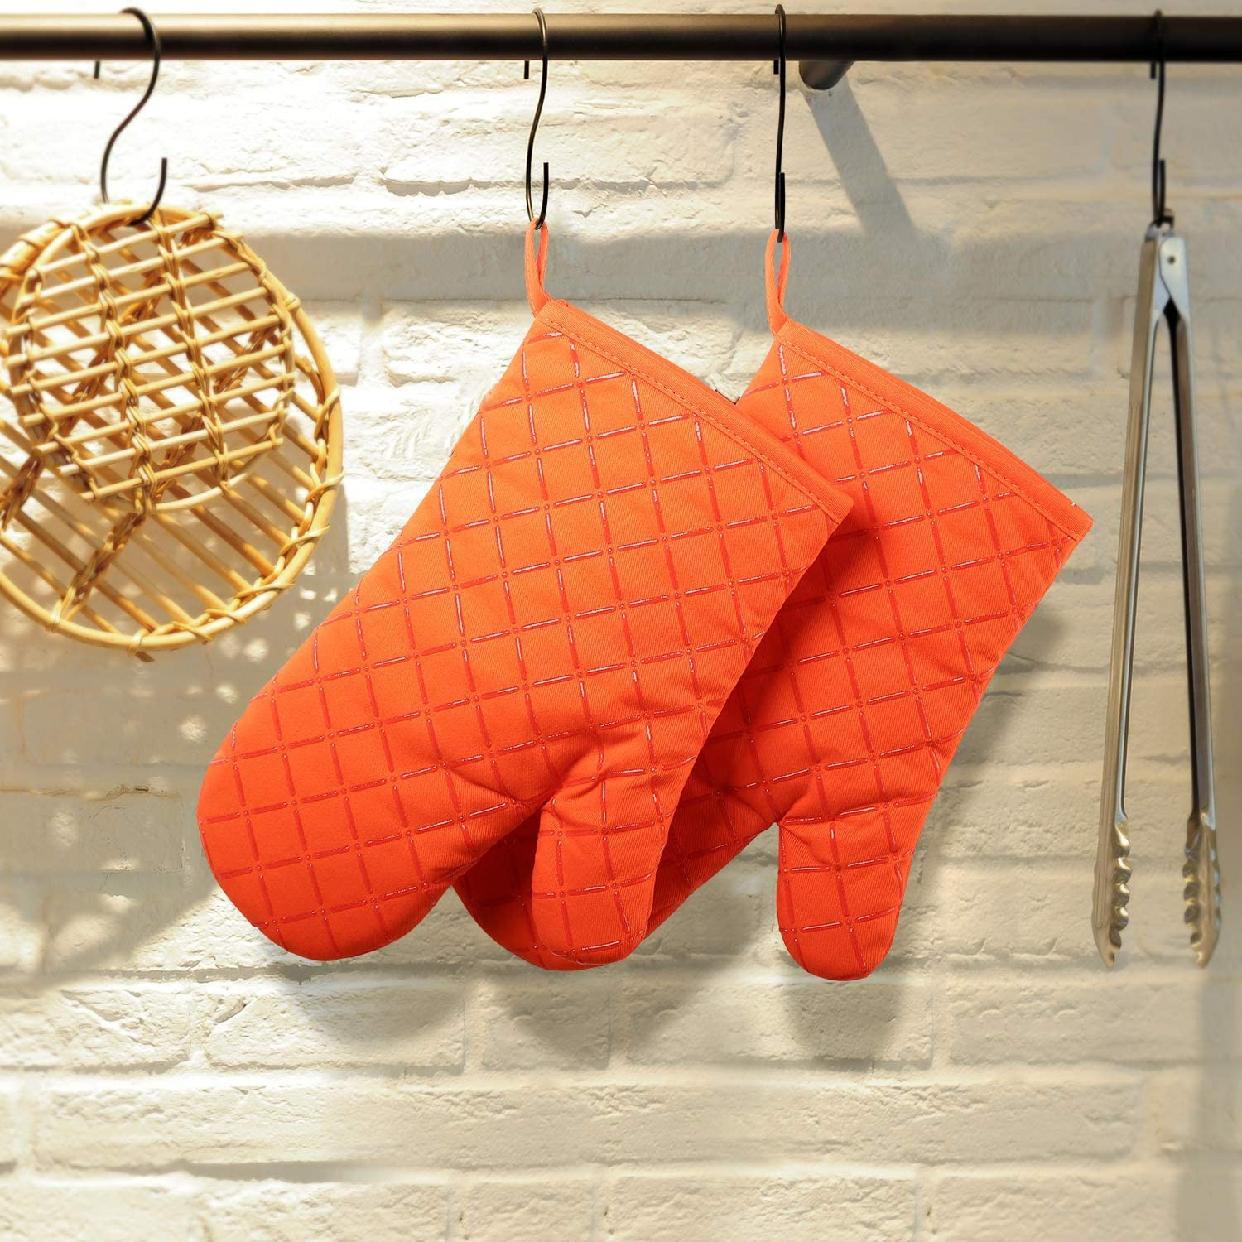 Big Urite(ビッグウライト) 断熱オーブンミトン 2枚セット(オレンジ)の商品画像5